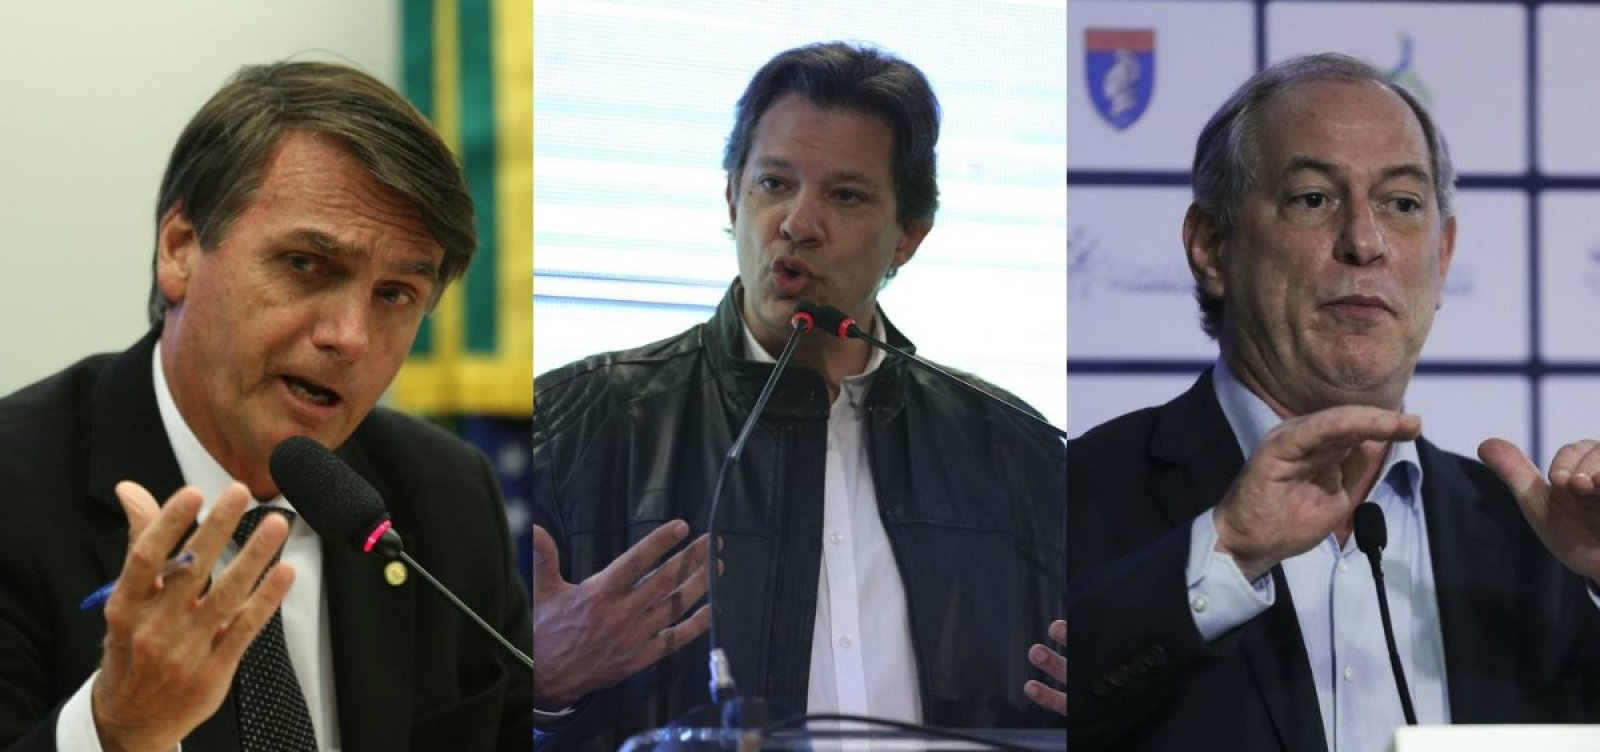 [Datafolha: Bolsonaro chega a 28% e Haddad sobe para 16%; Ciro lidera no 2º turno]